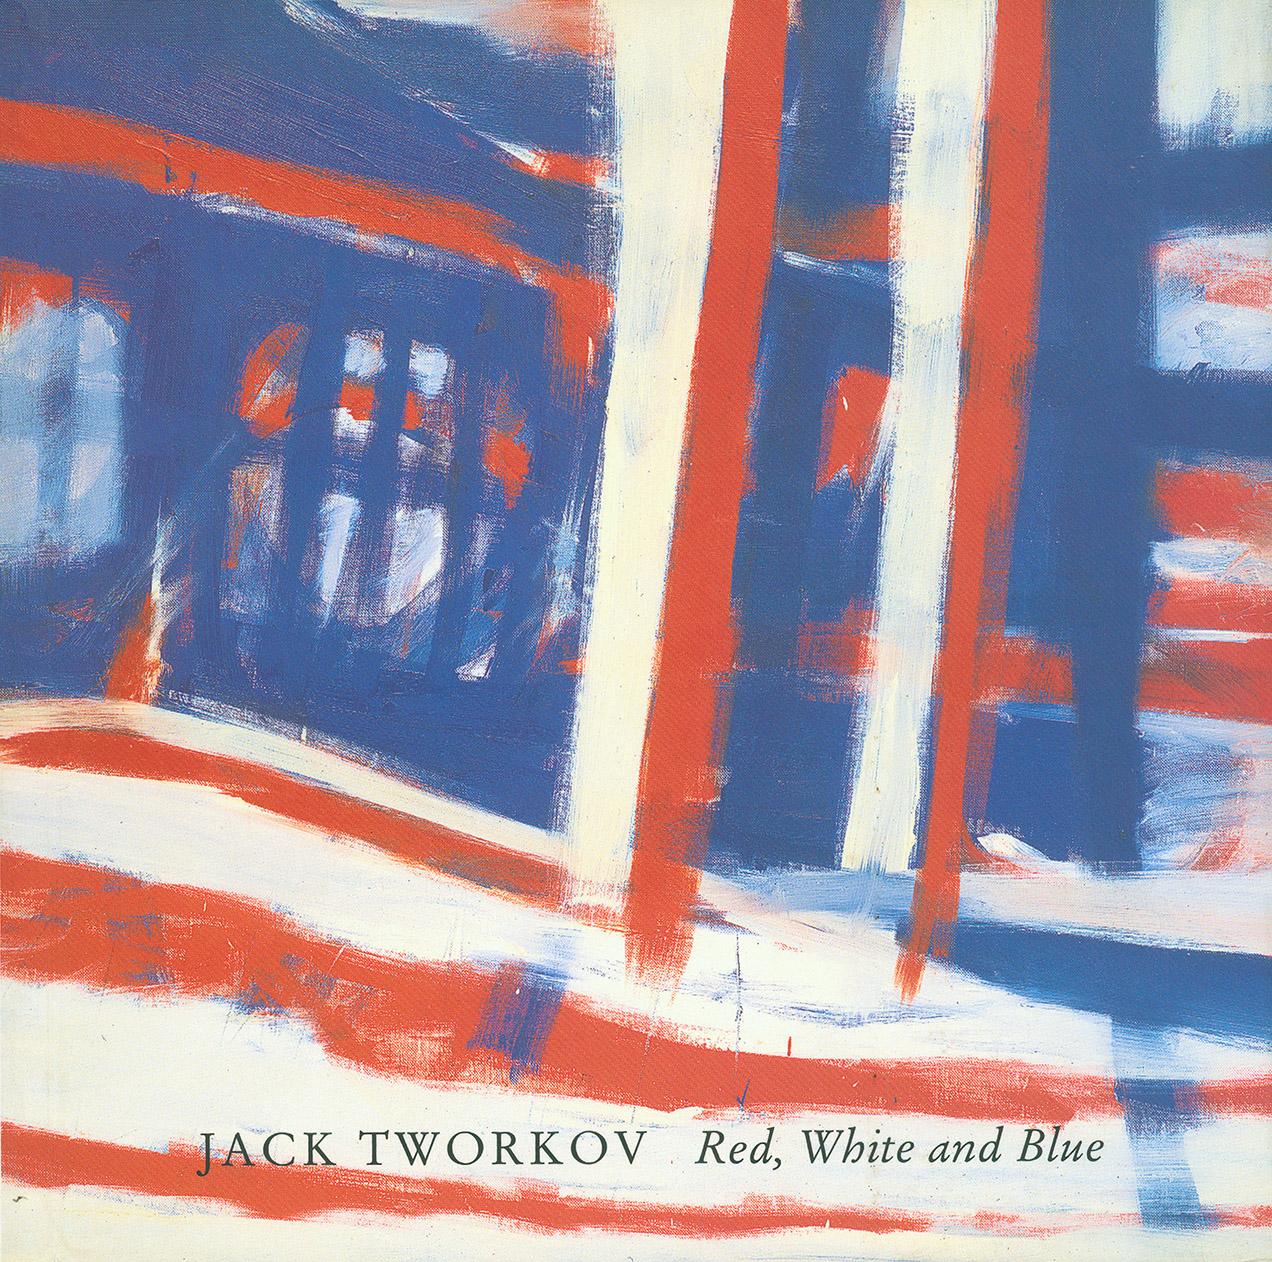 Tworkov-Jack_MIN_2002.jpg